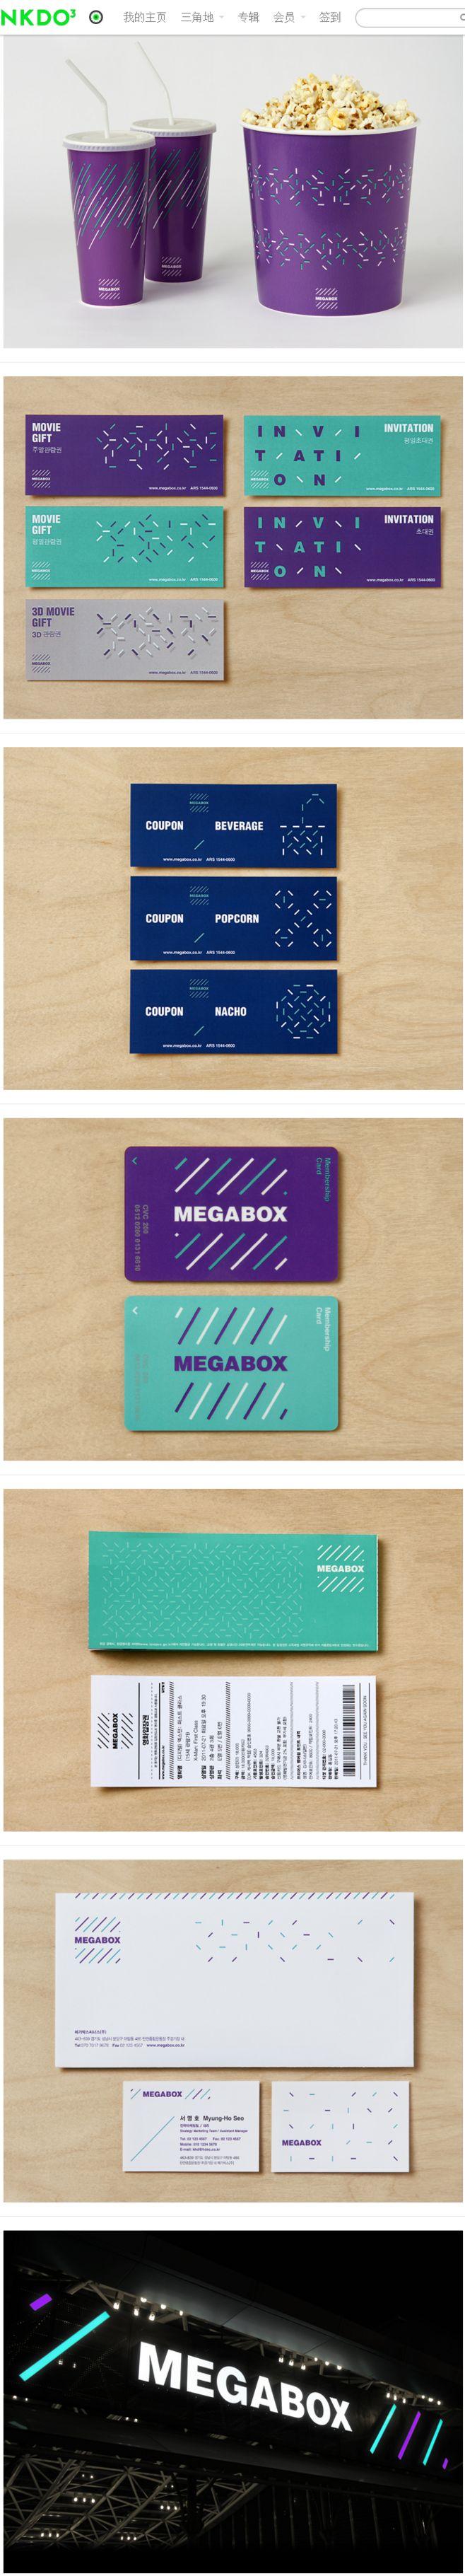 Megabox企业形象设计 设计圈 展示...